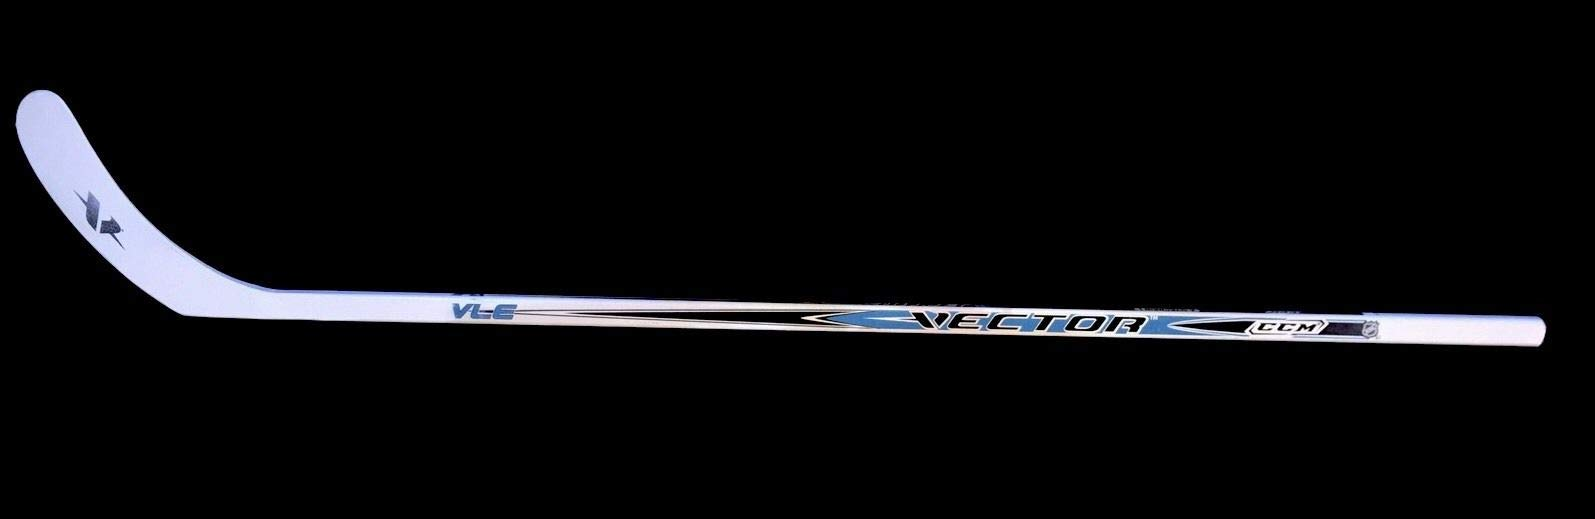 Jarome Iginla Autographed Signed Colorado Avalanche Stick JSA Authentic Flames